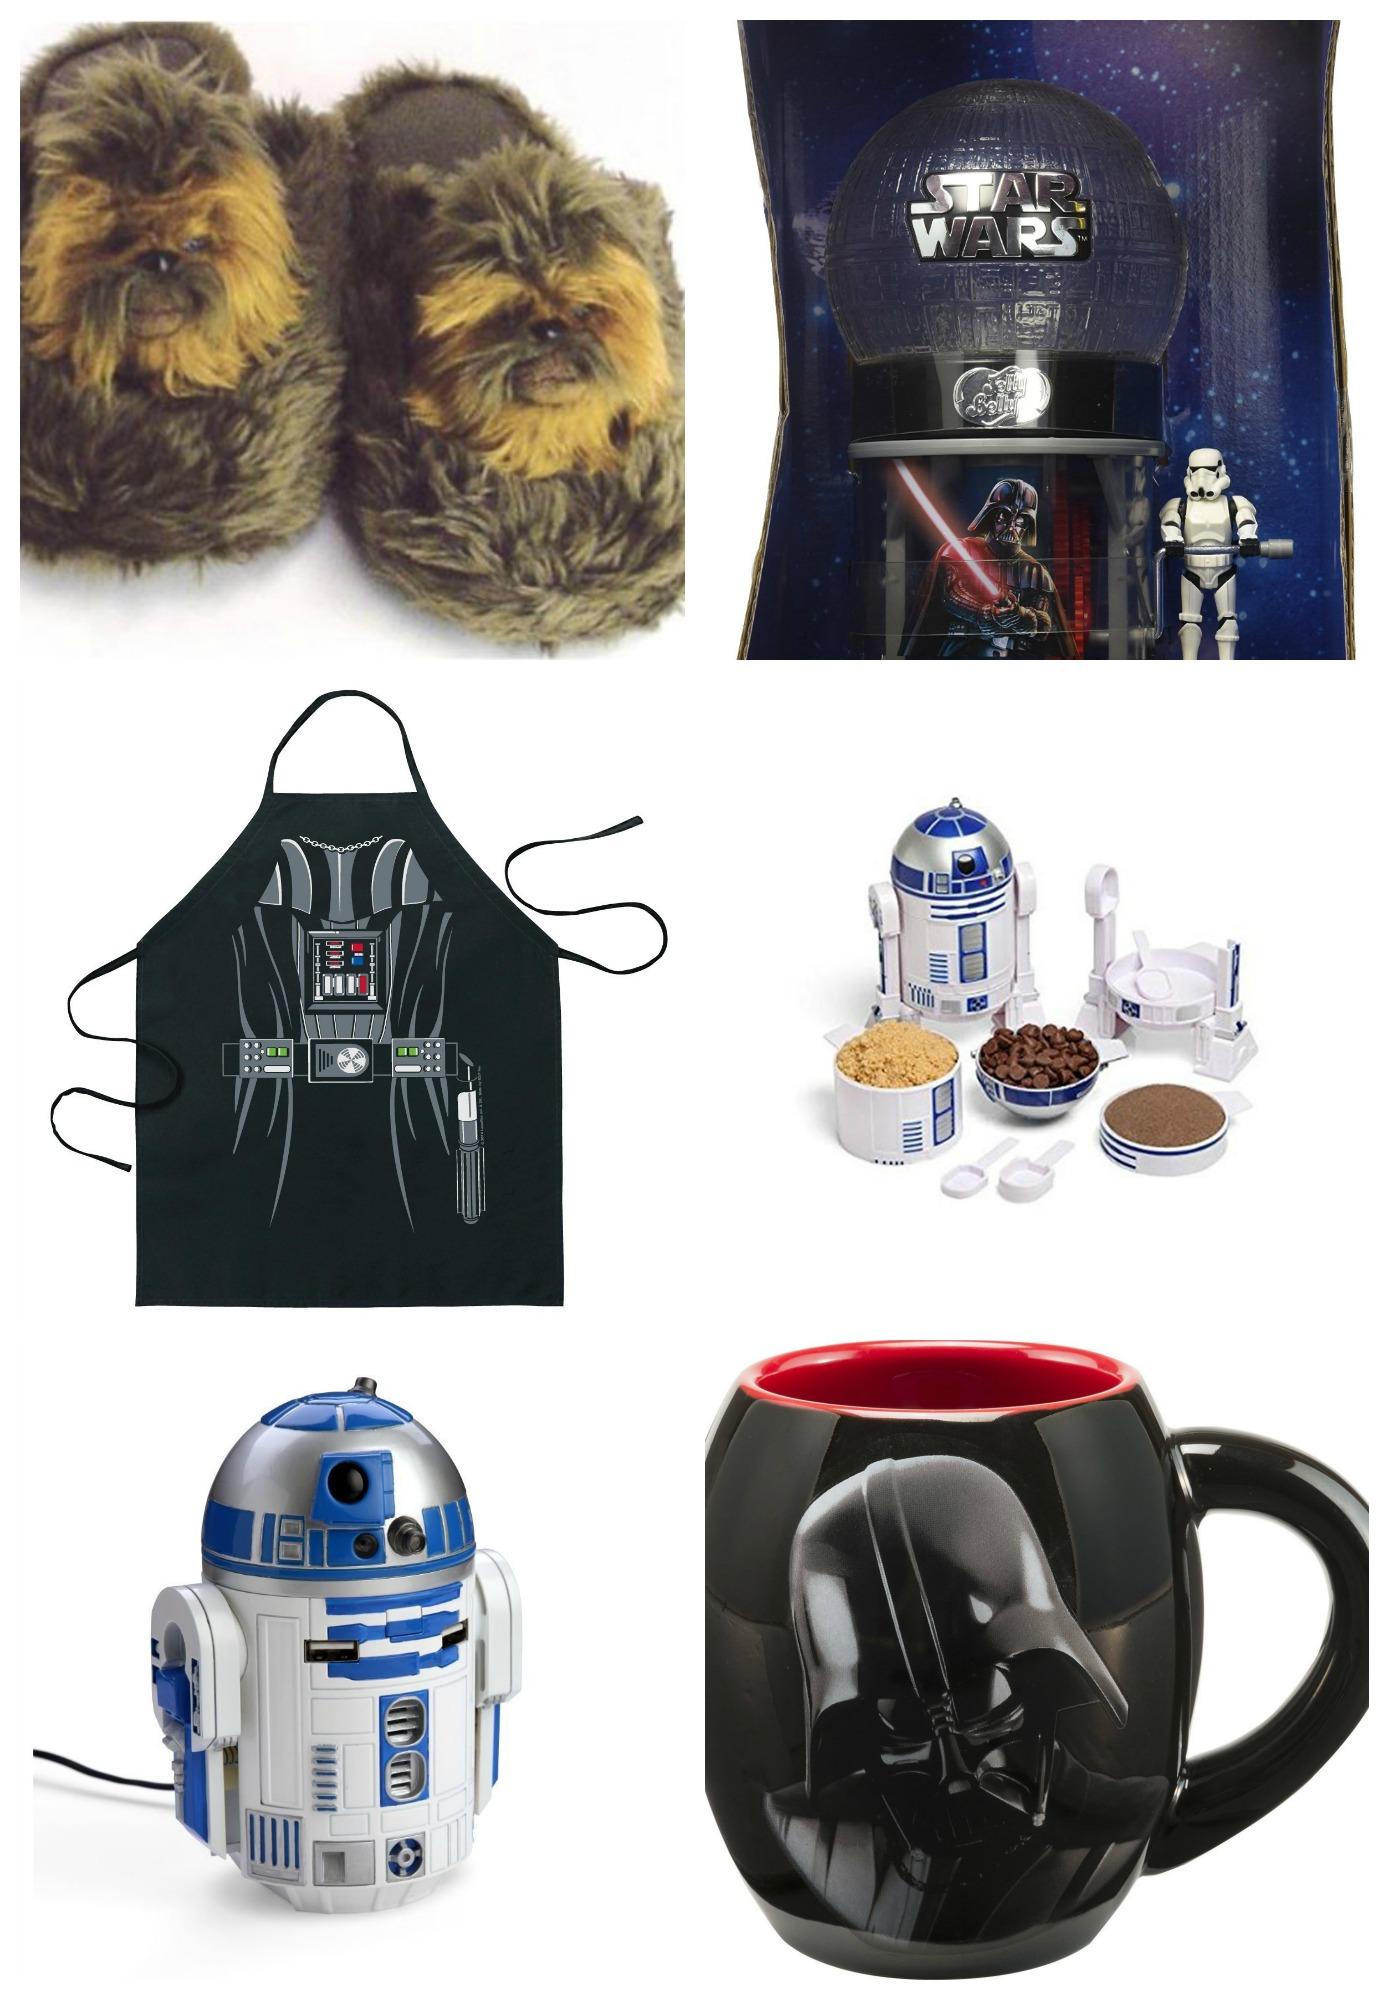 Fun Star Wars Gift Ideas!